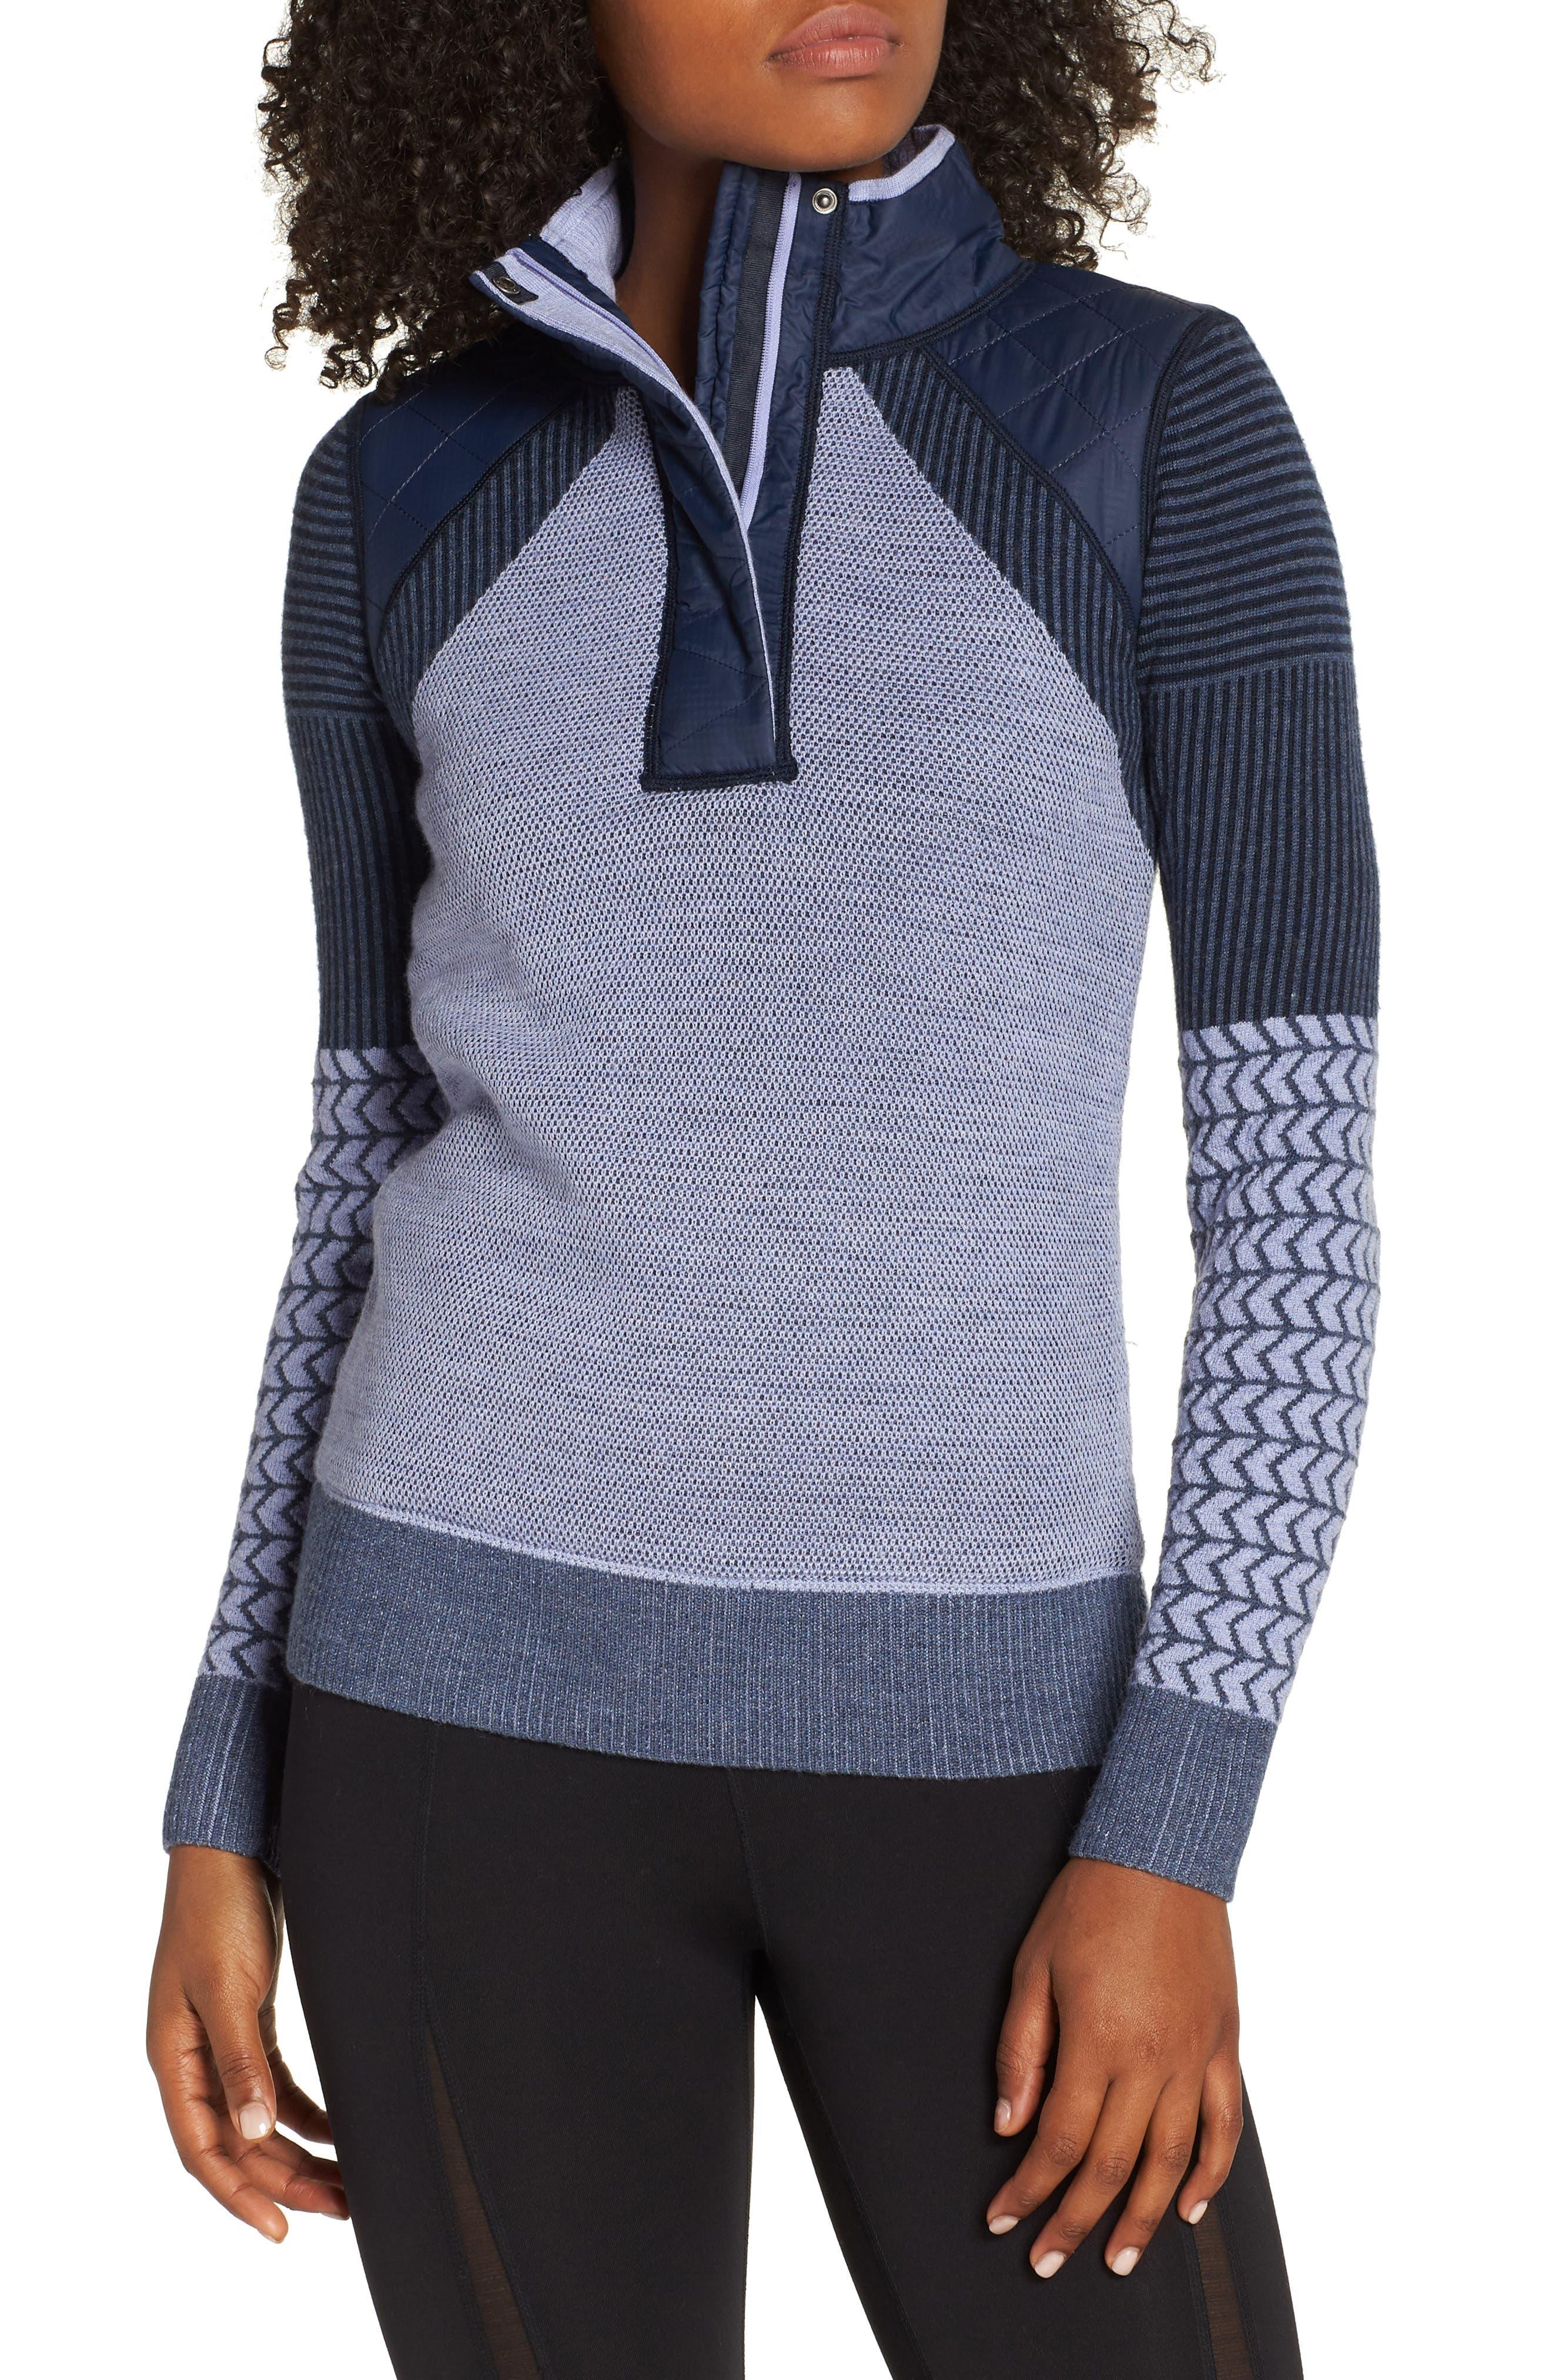 Ski Ninja Pullover Sweater,                             Main thumbnail 1, color,                             410